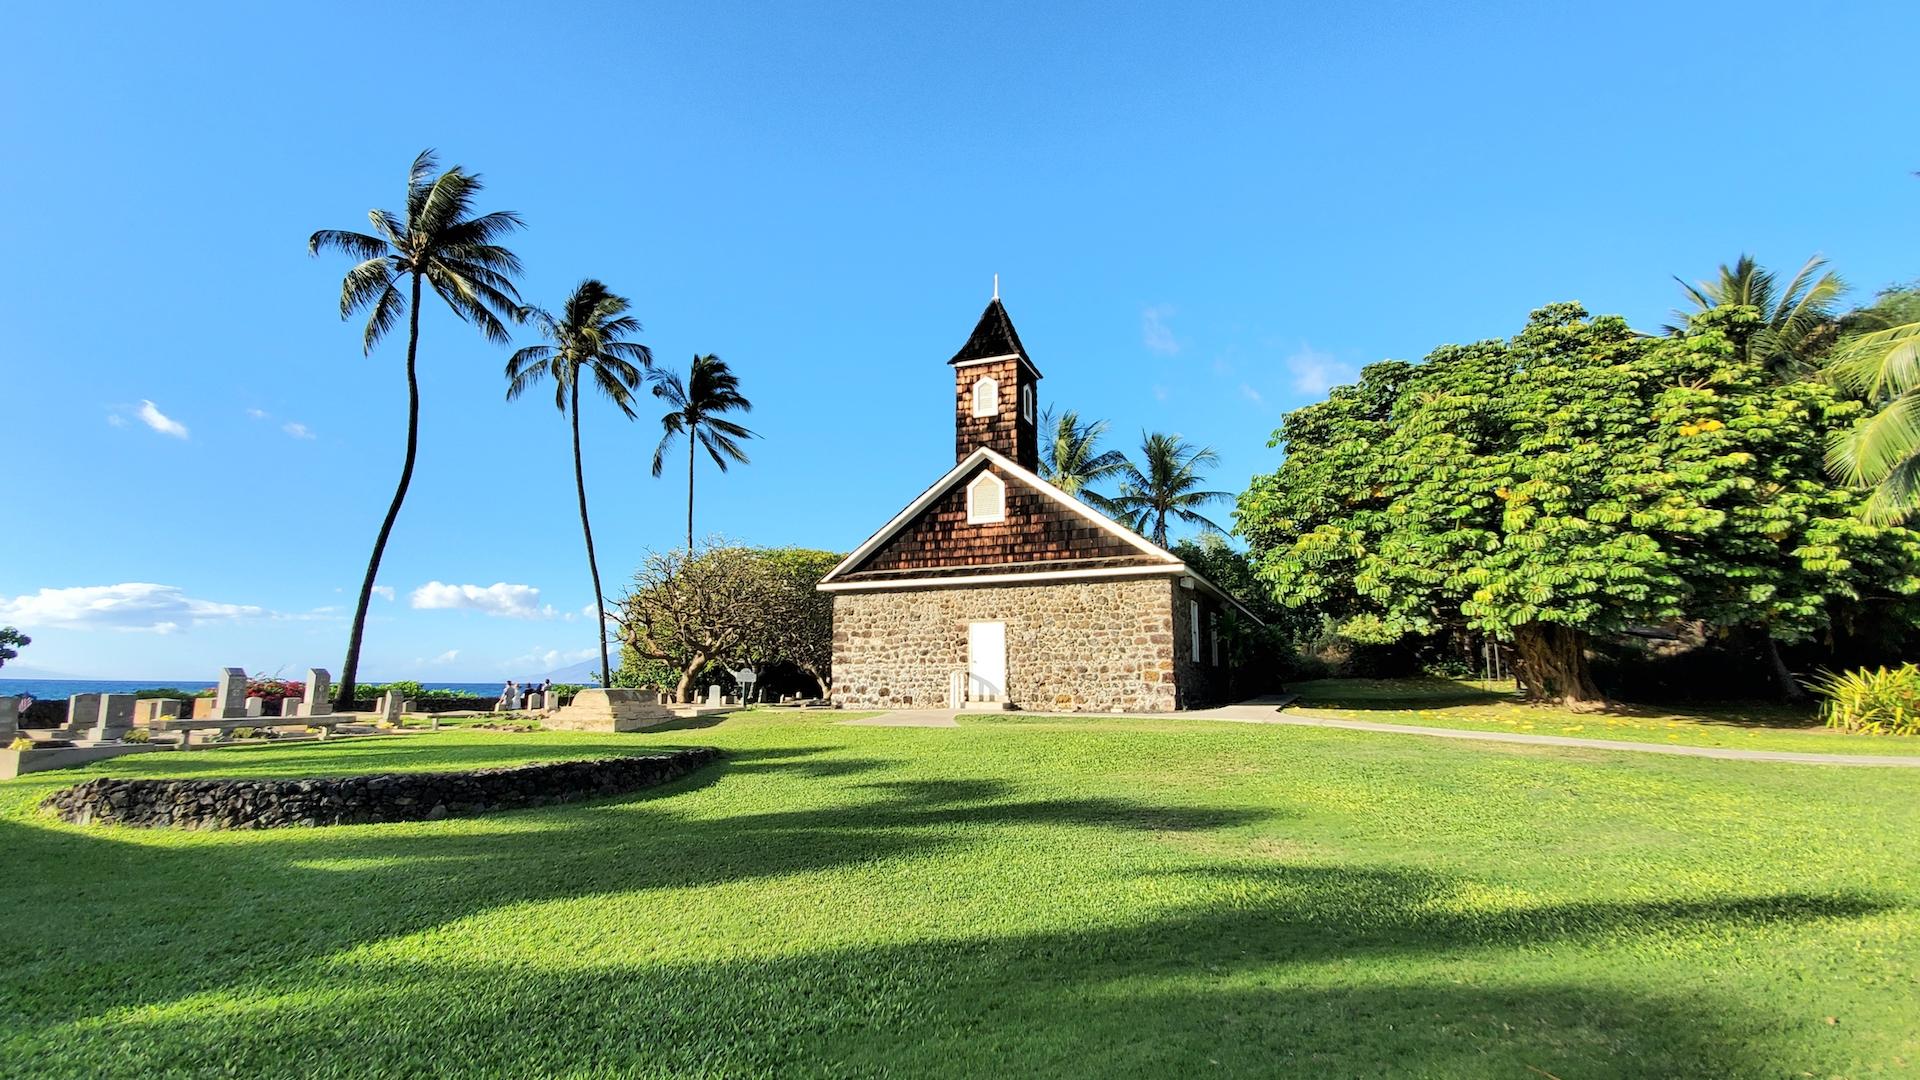 Keawala'i Congregational Church located in Makena Maui.